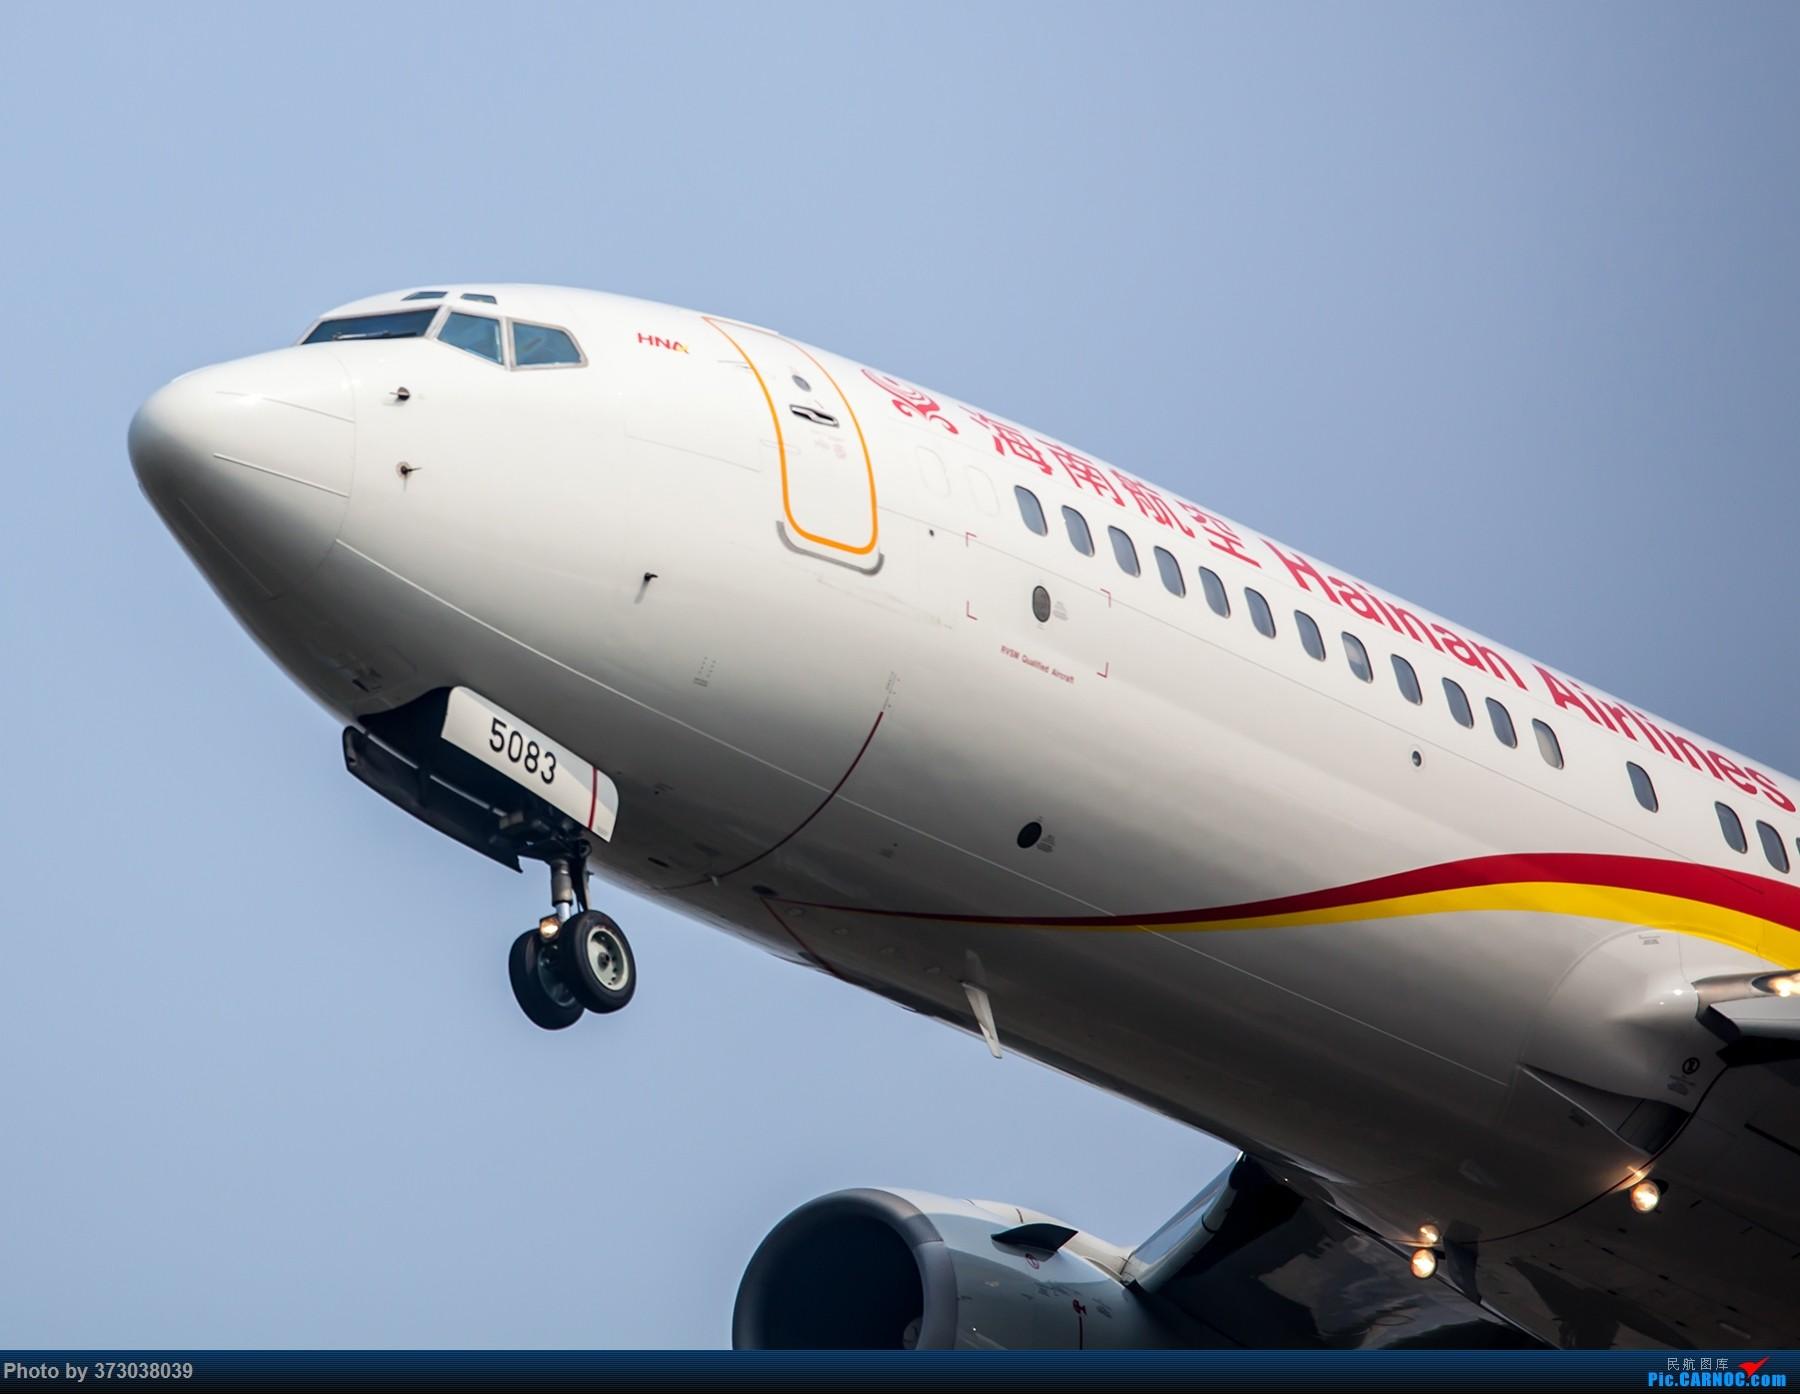 Re:[原创]【杭州飞友会】A320Neo迪士尼杭州萧山机场拍机班门弄斧记 BOEING 737-800 B-5083 中国杭州萧山国际机场